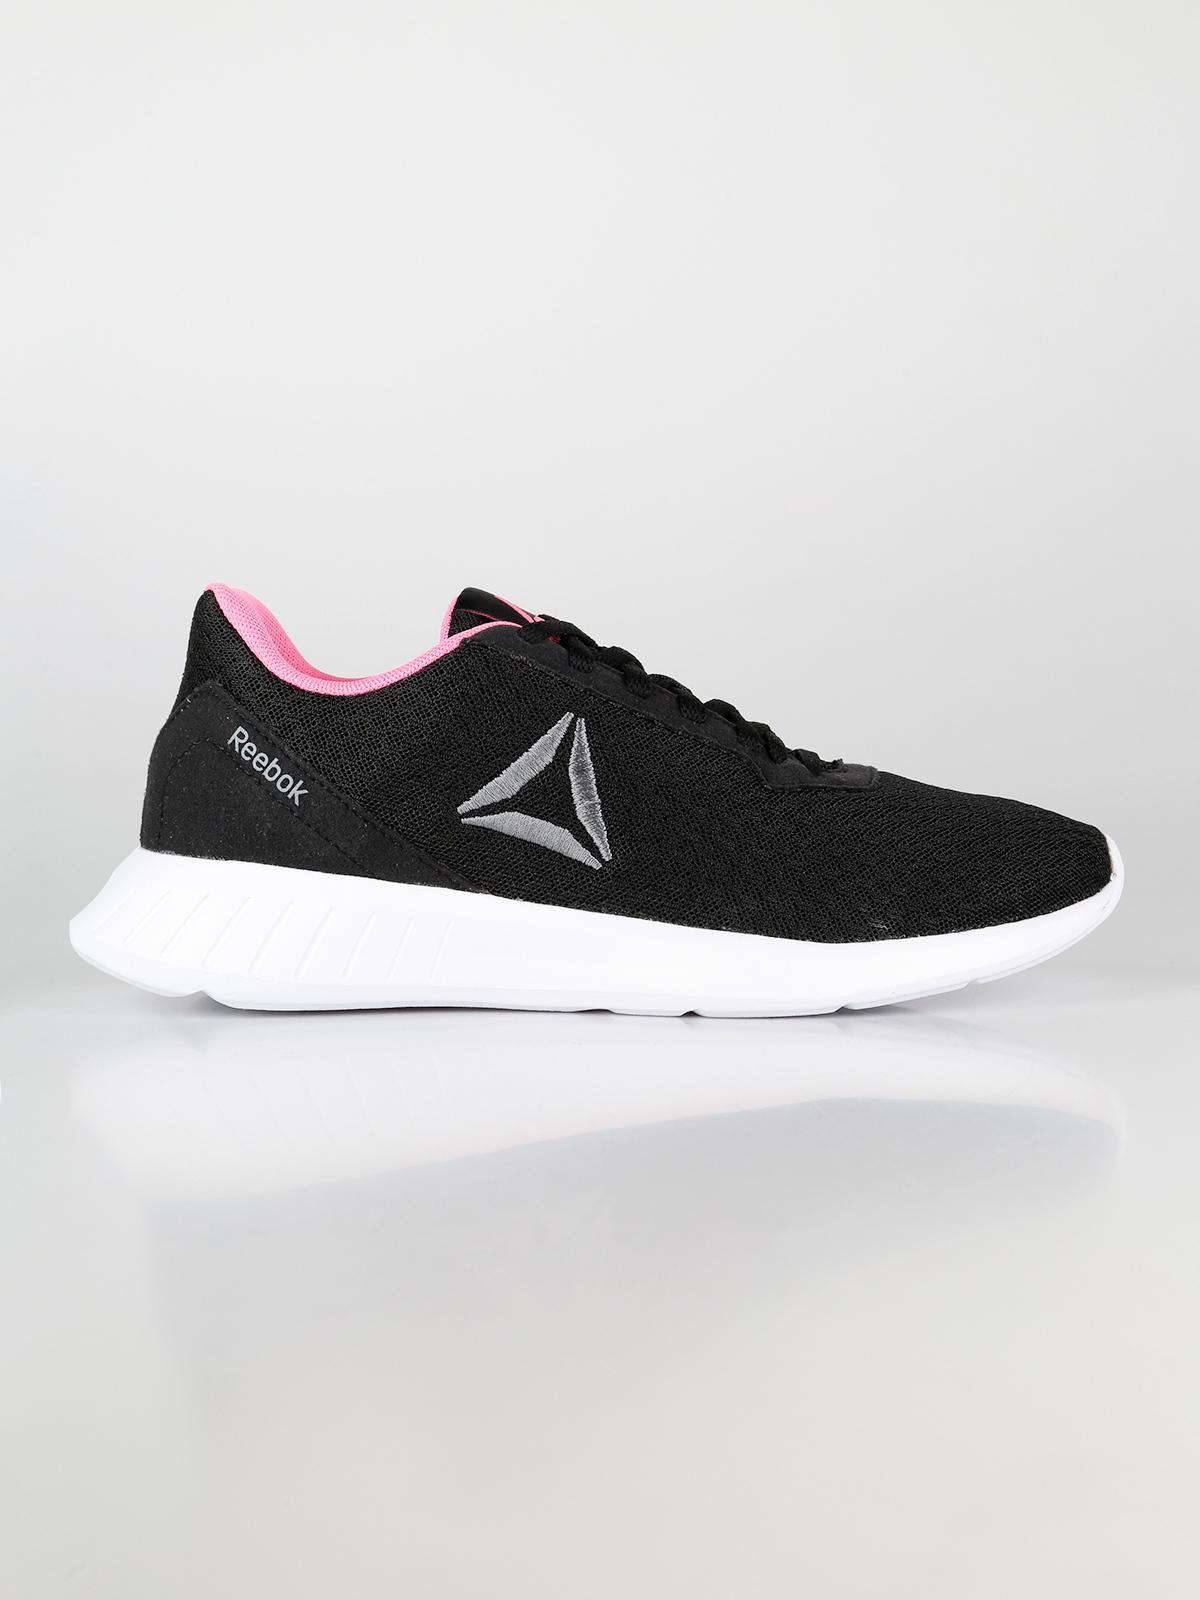 Lite Running scarpe running donna nere reebok | MecShopping